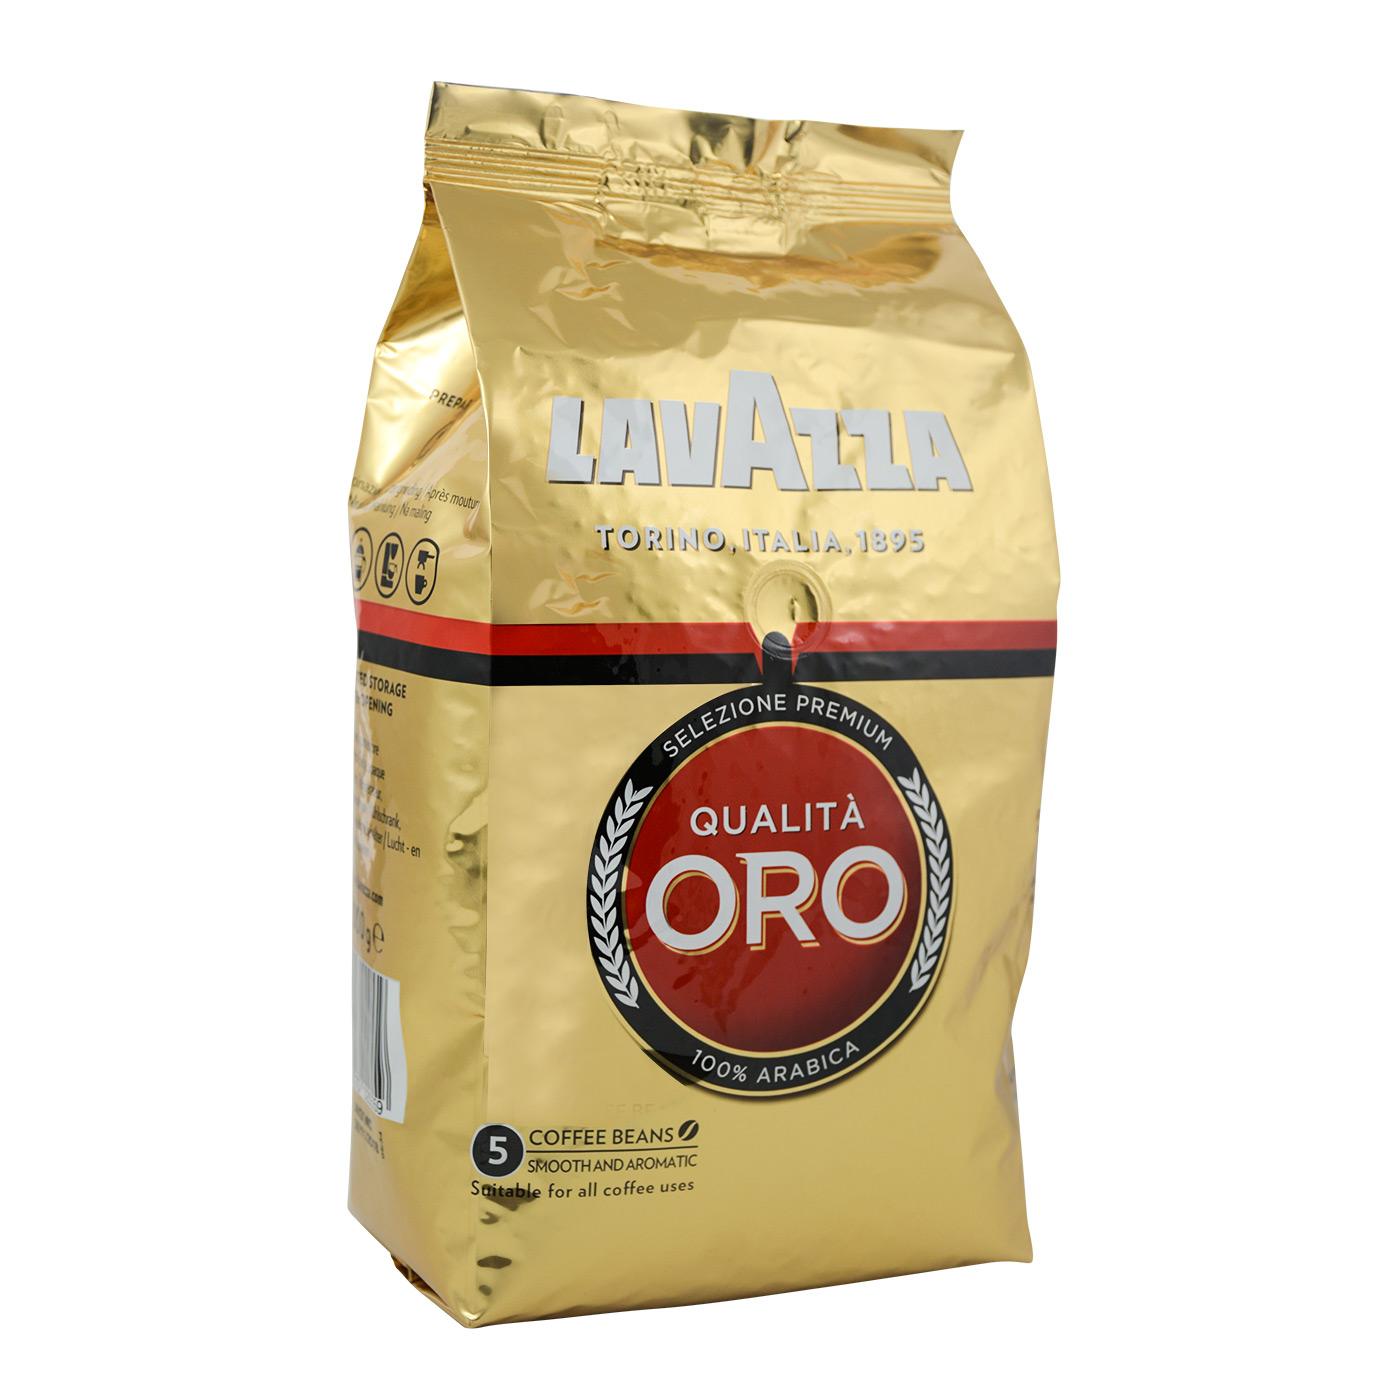 Кофе в зернах Lavazza Qualita Oro 1 кг кофе в зернах lavazza qualita rossa 1 кг